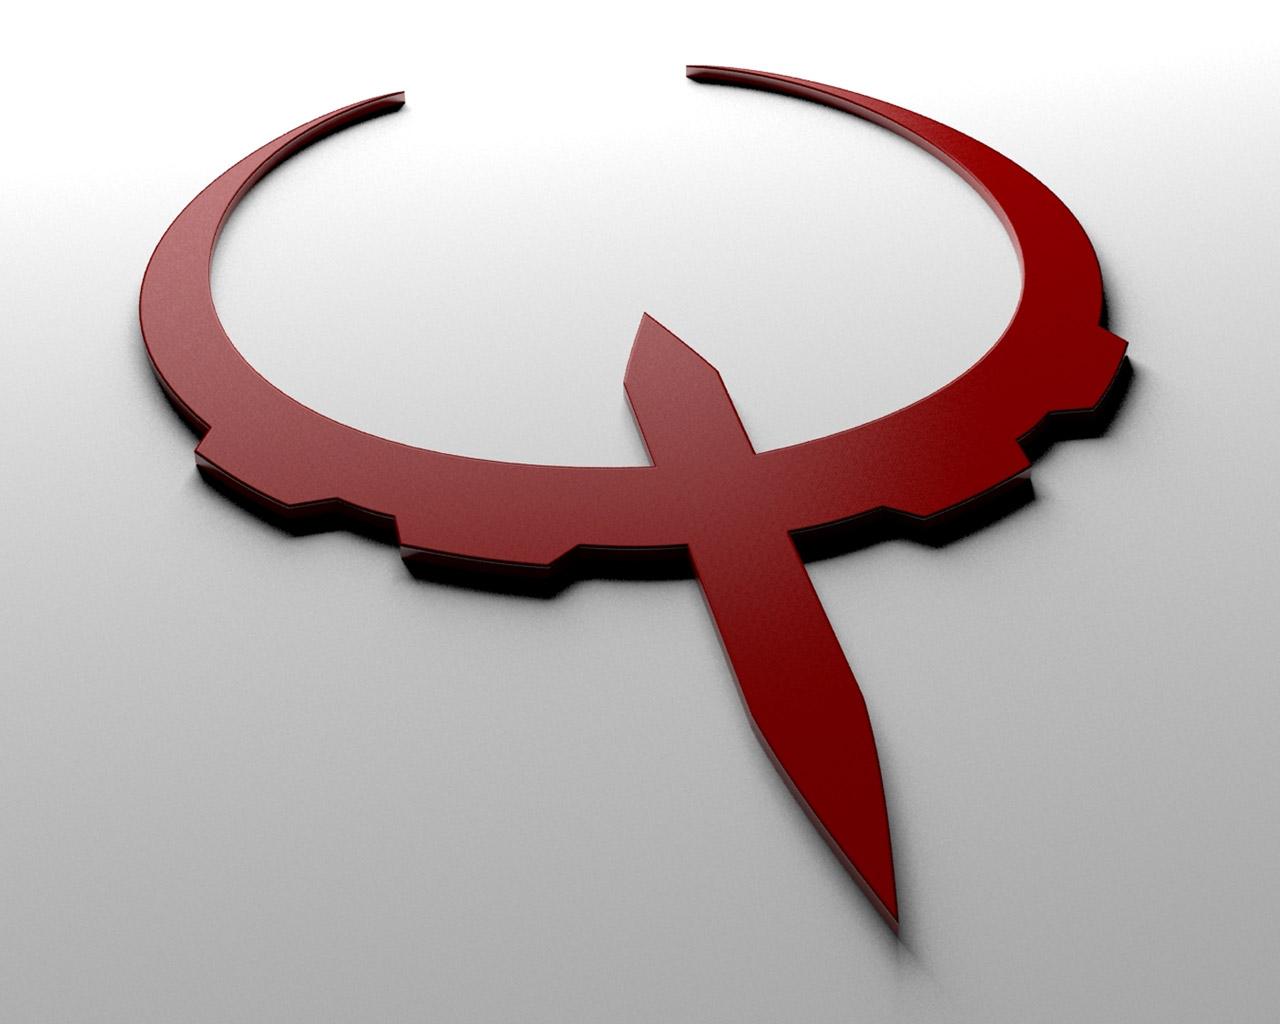 Free Quake Wallpaper in 1280x1024